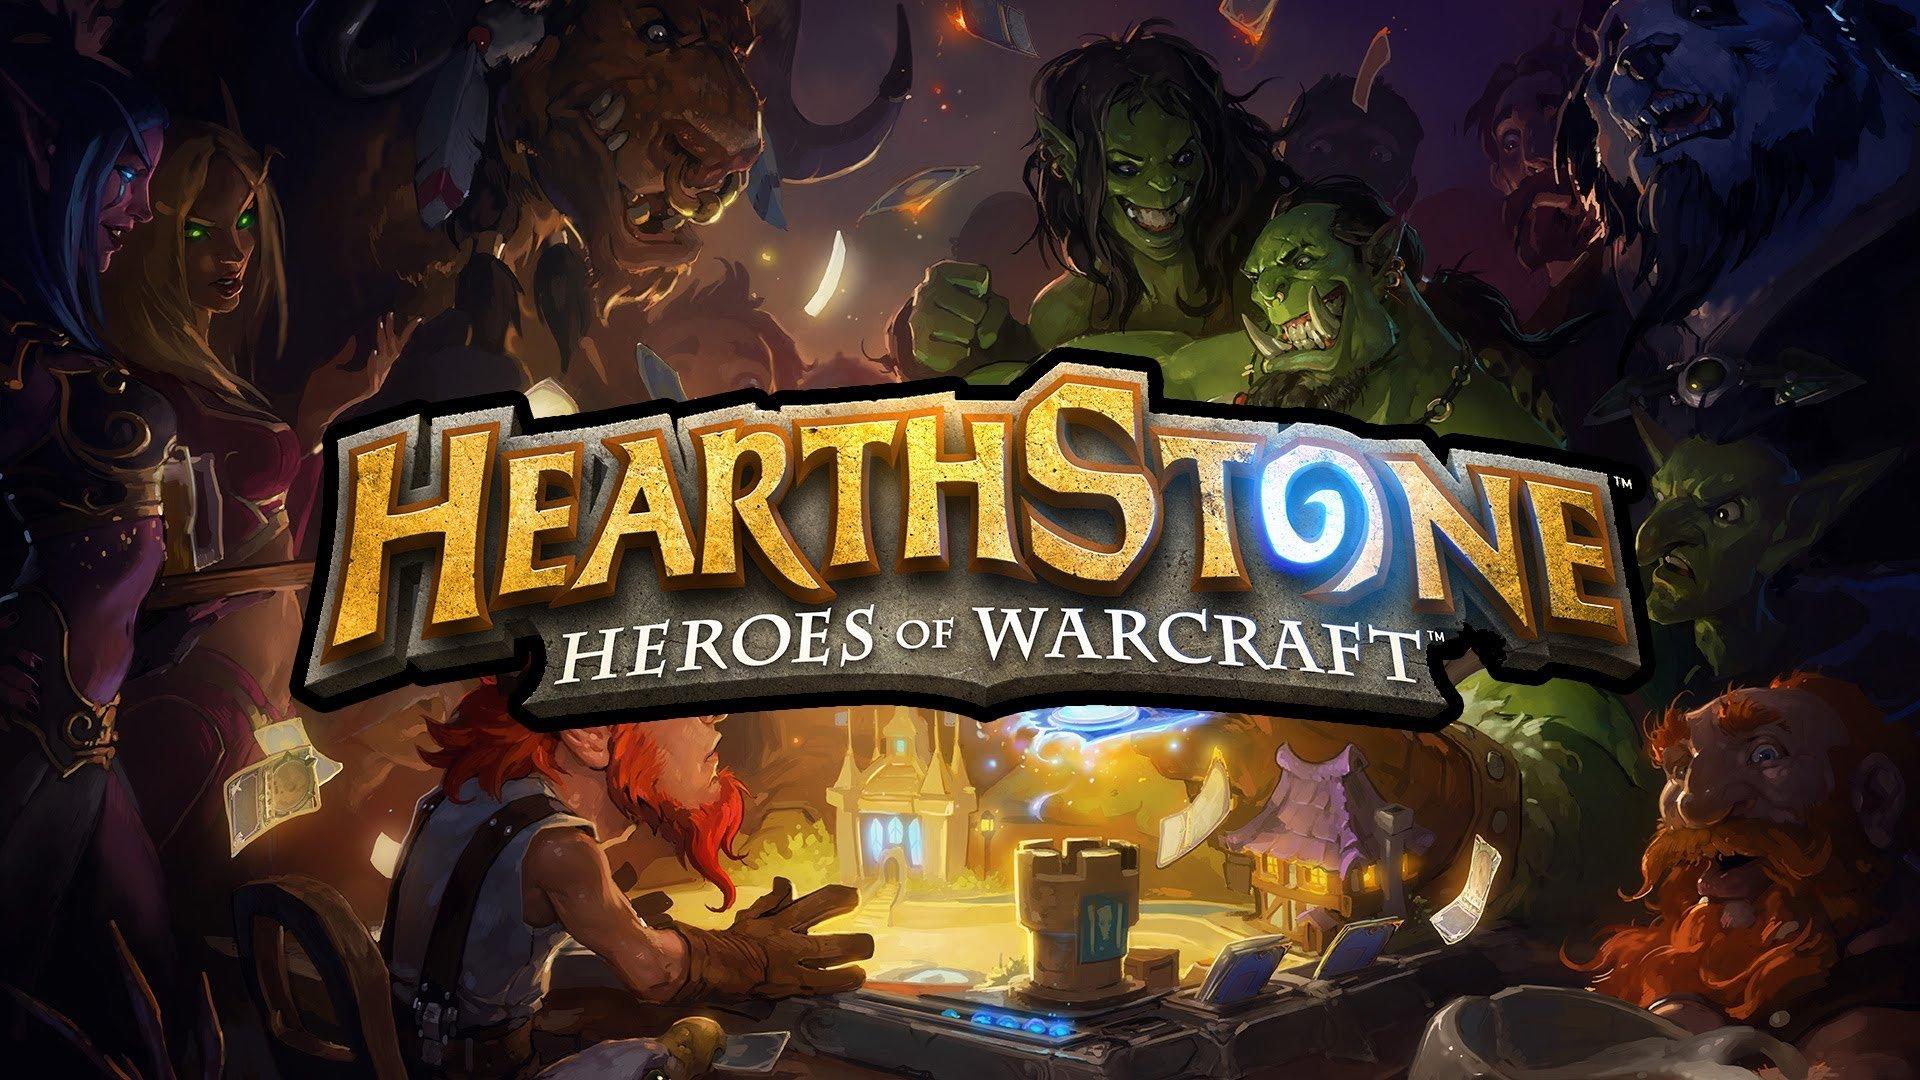 Hearthstone Blizzard Boycott Blizzard Hearthstone Banned